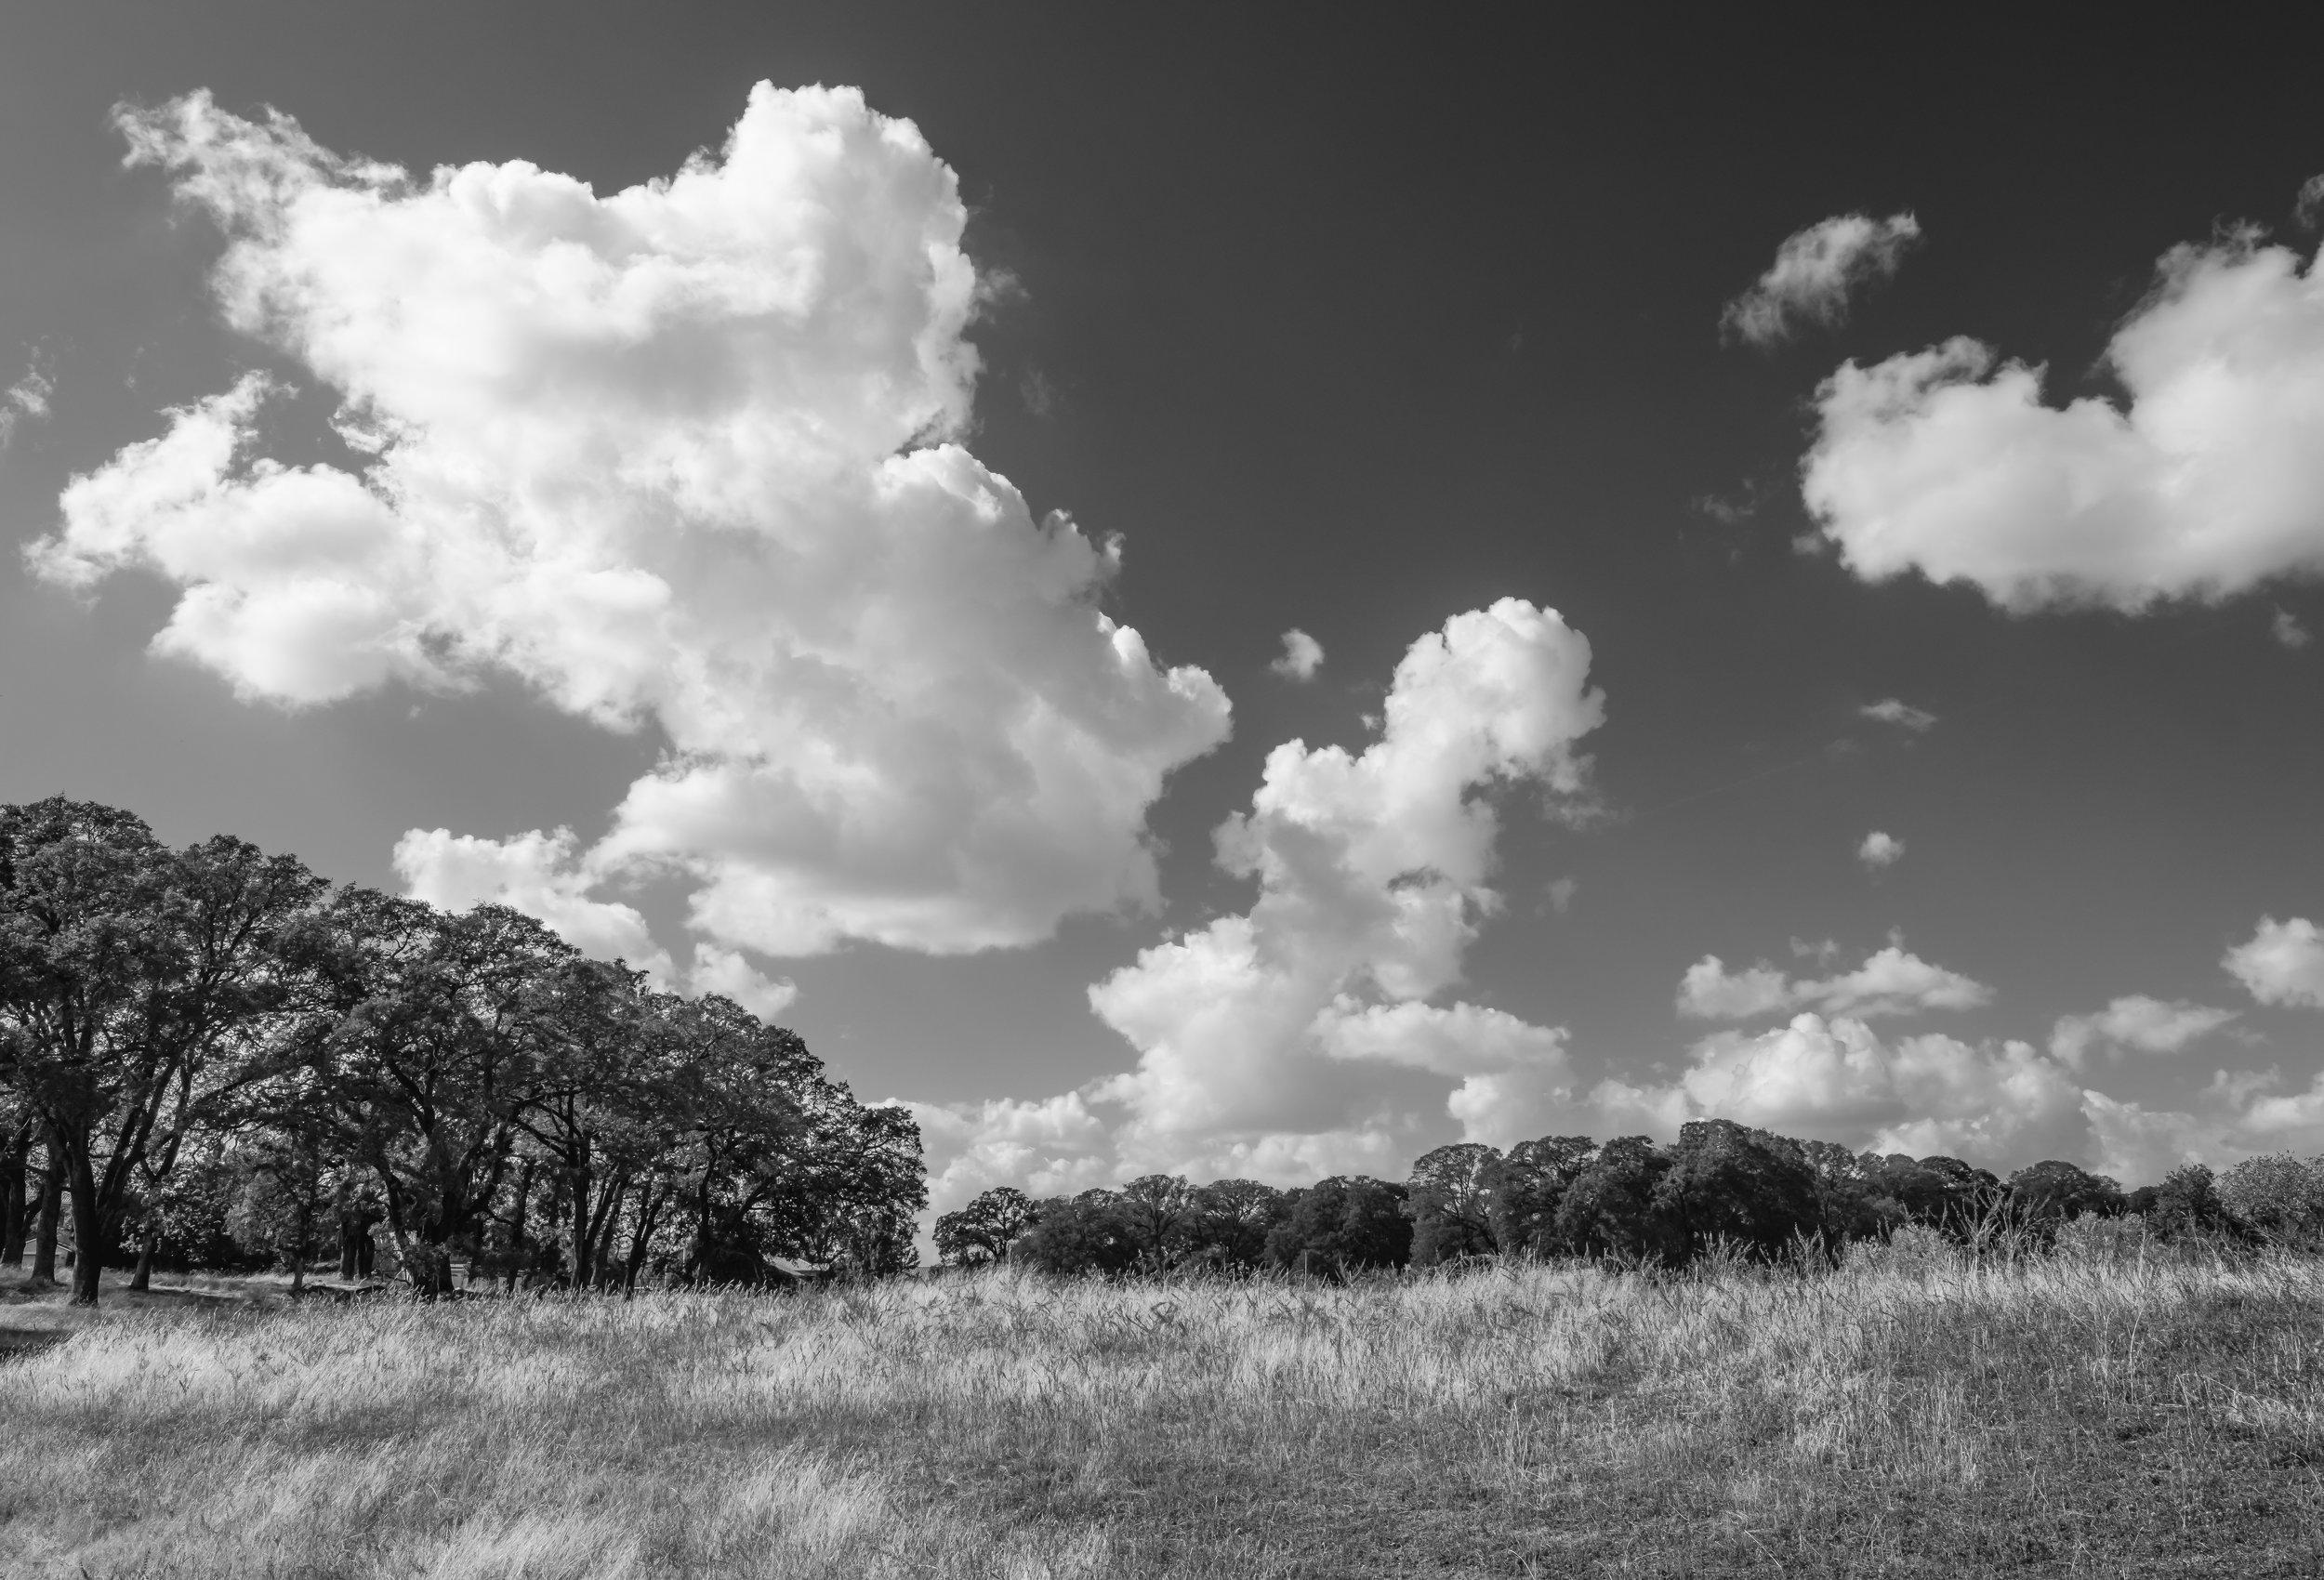 First Storm Cloud Study 1